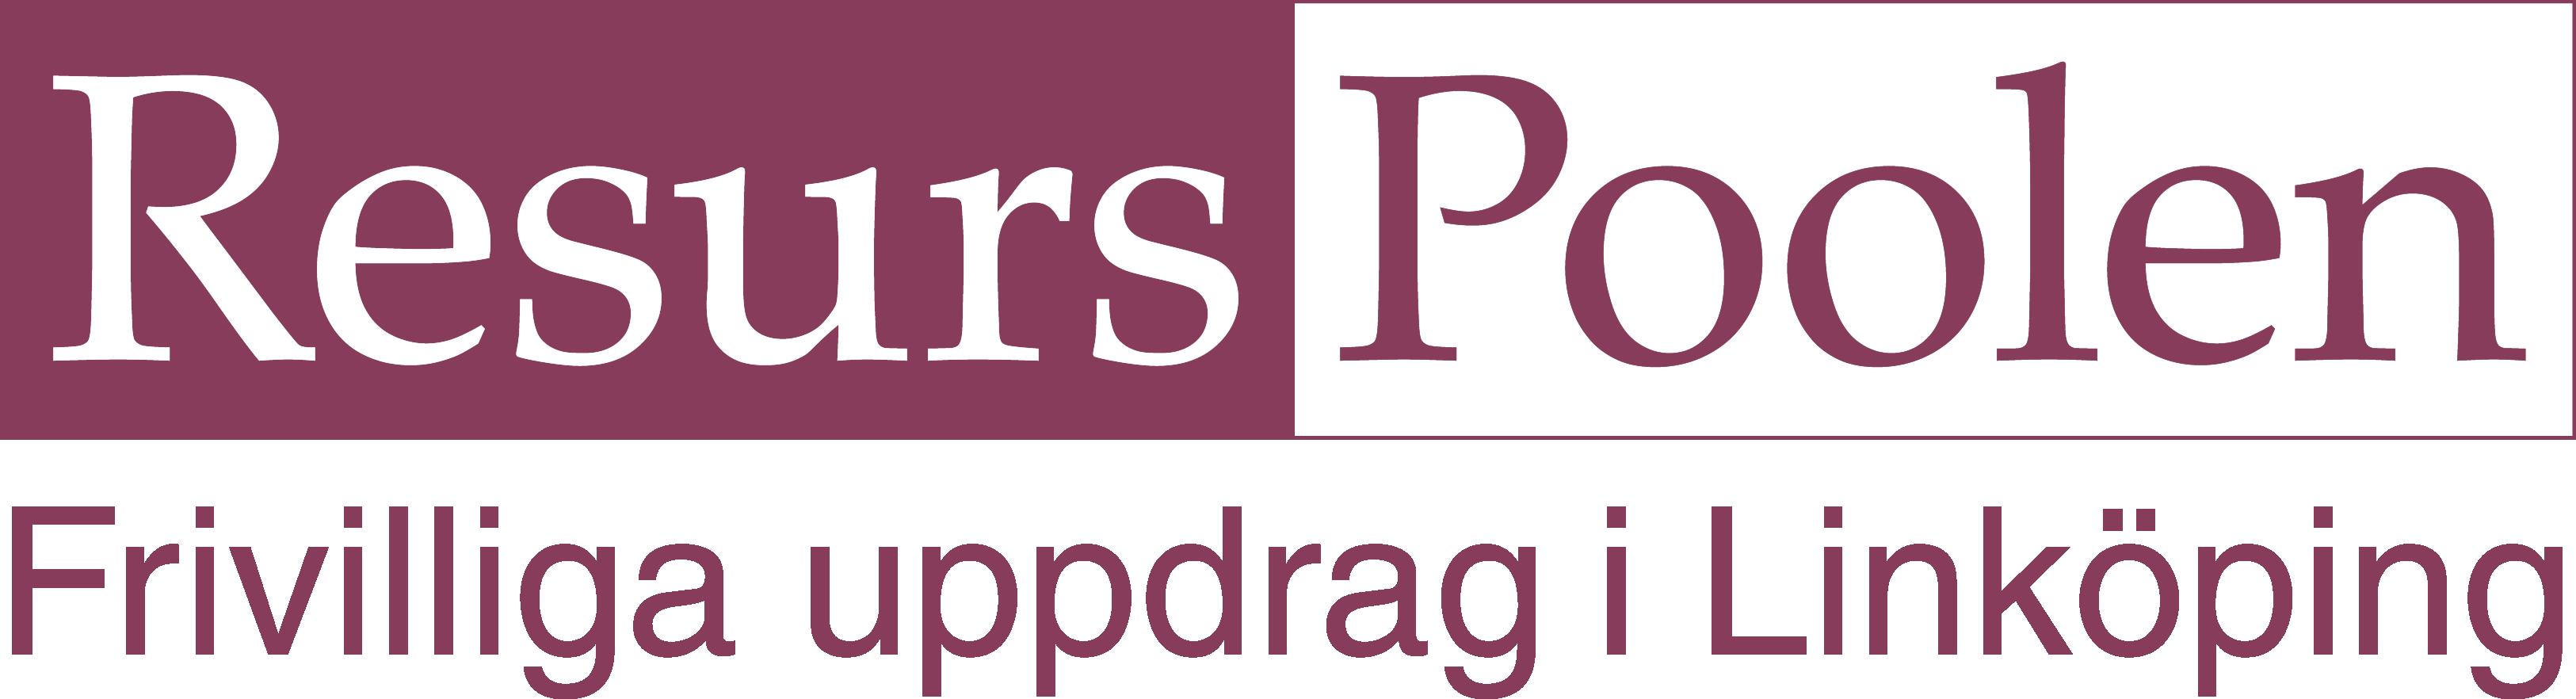 Resurspoolen_Logonamn_genomskinlig